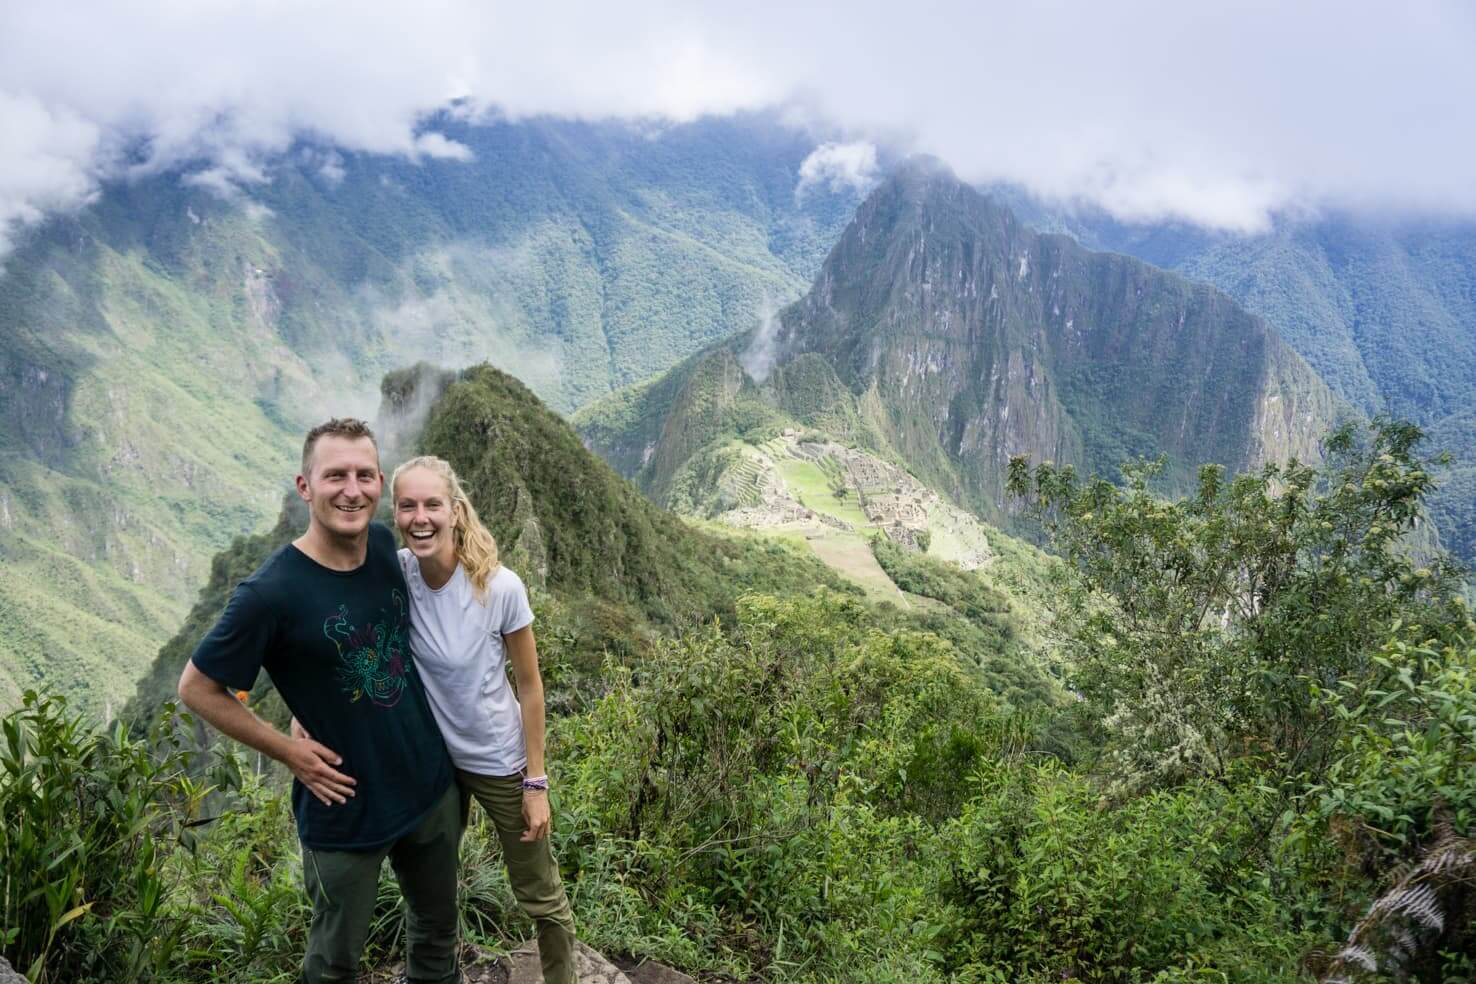 Elevation Gain Stone Mountain Hike : Machu picchu mountain hike